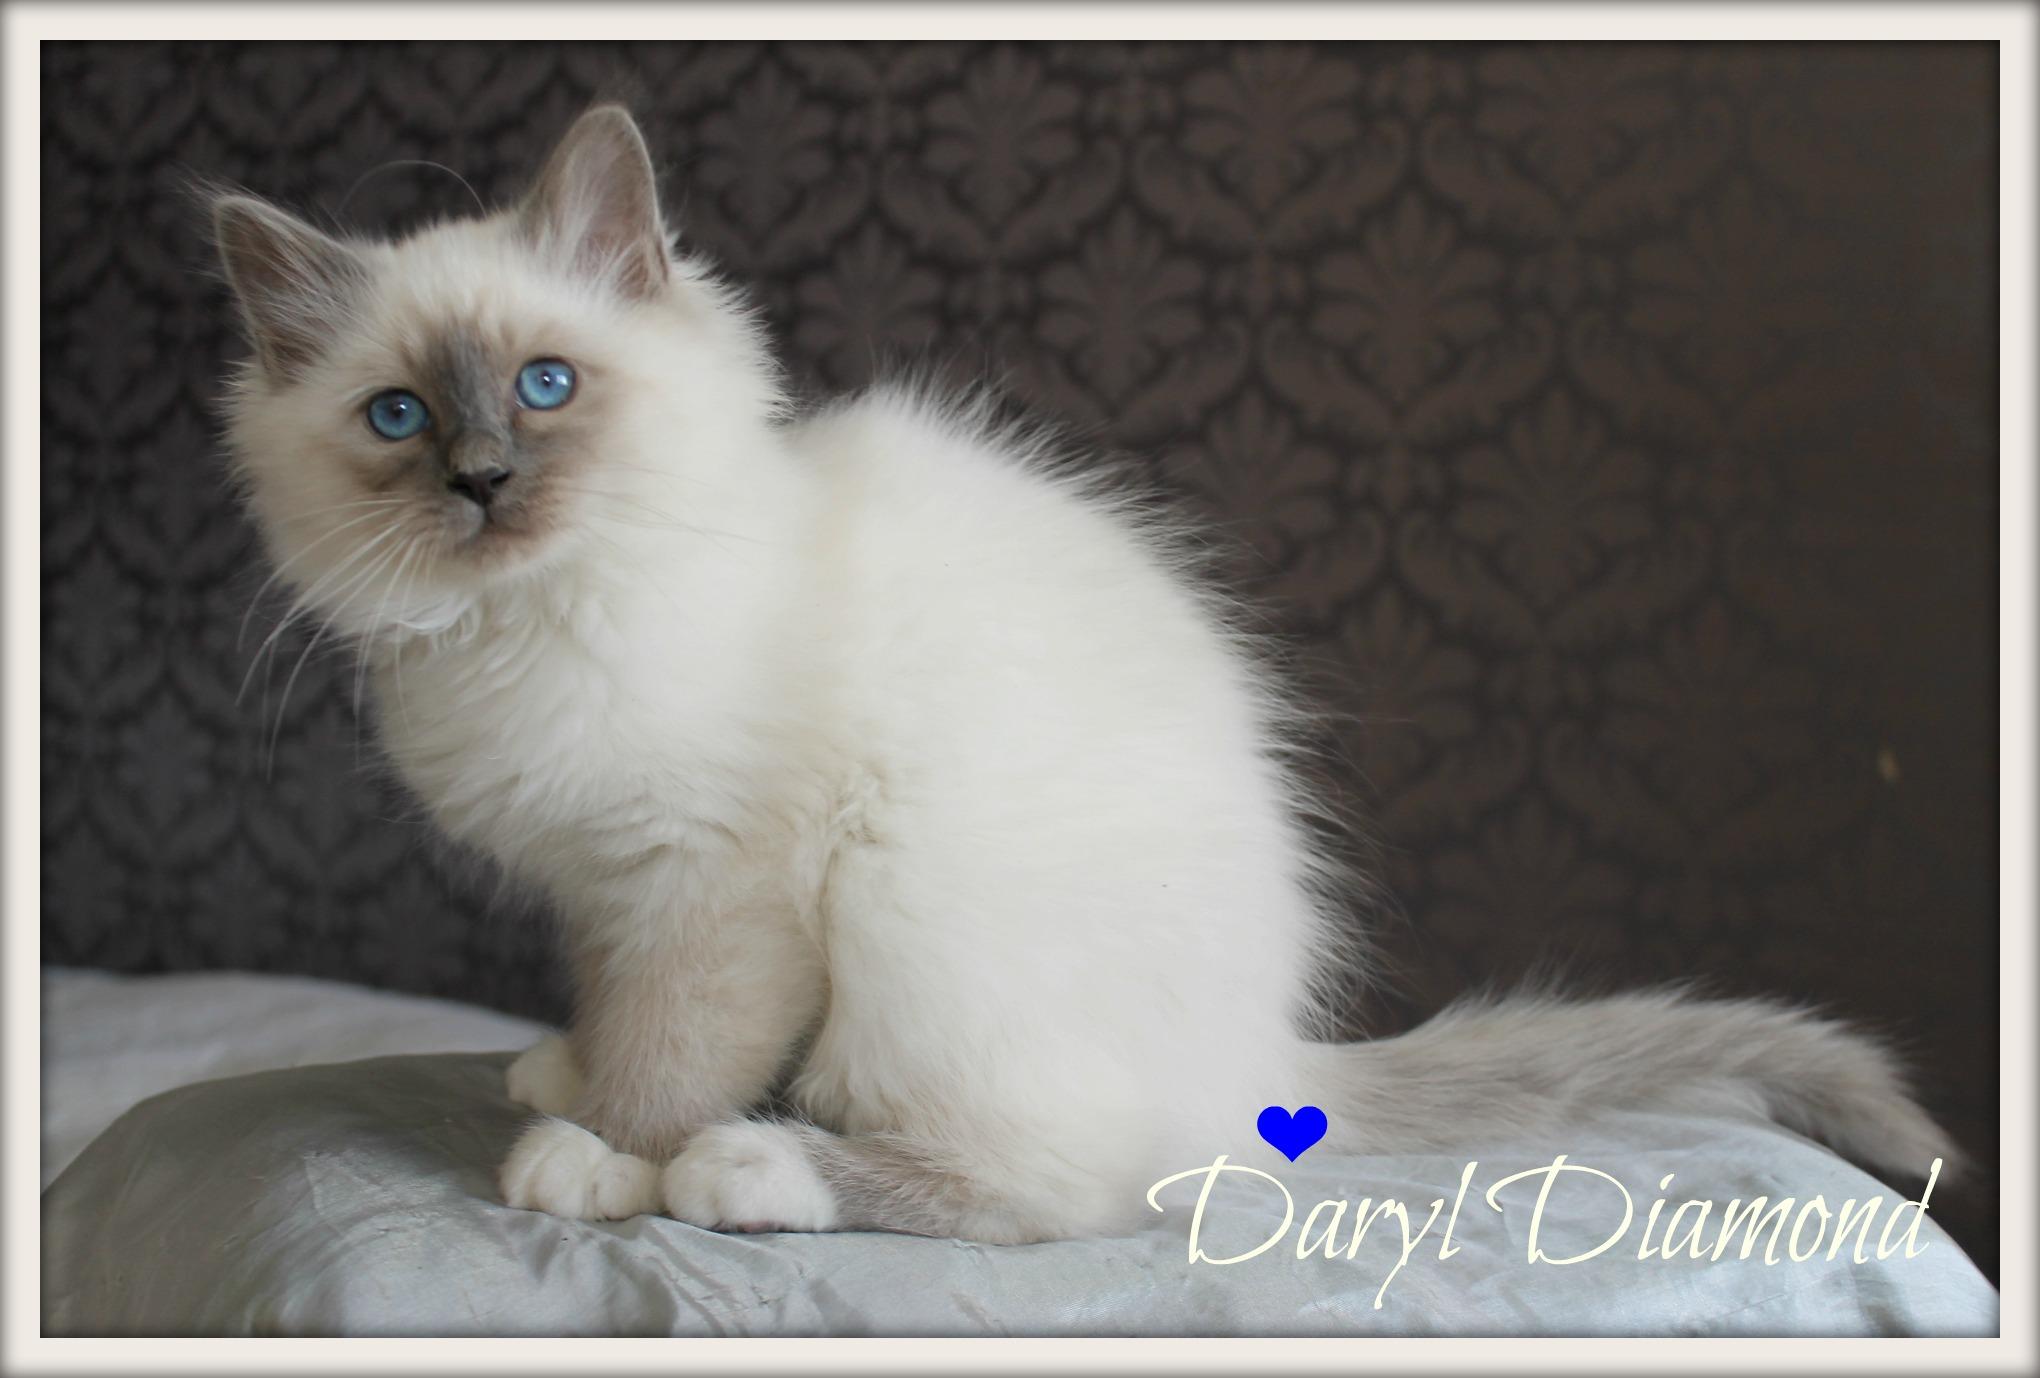 daryl-sp